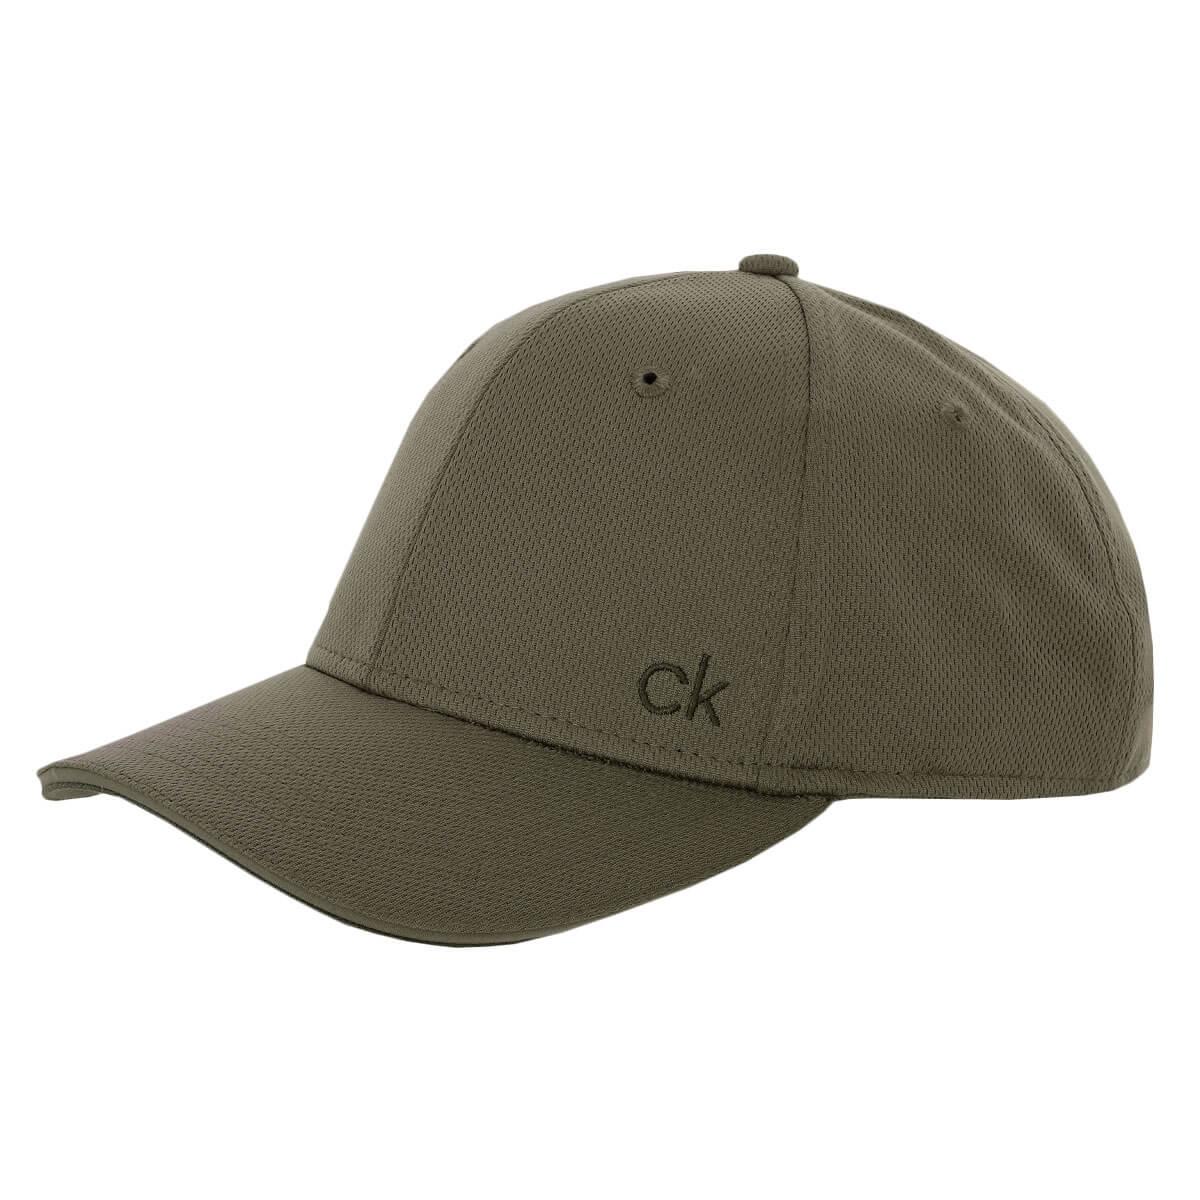 Calvin-Klein-Golf-2019-Airtex-Performance-Adjustable-Quick-Dry-Cap-40-OFF-RRP thumbnail 11